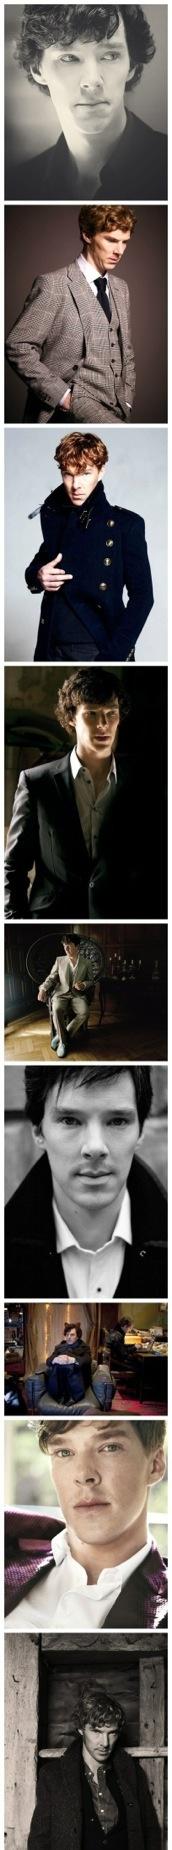 Benedict Cumberpatch